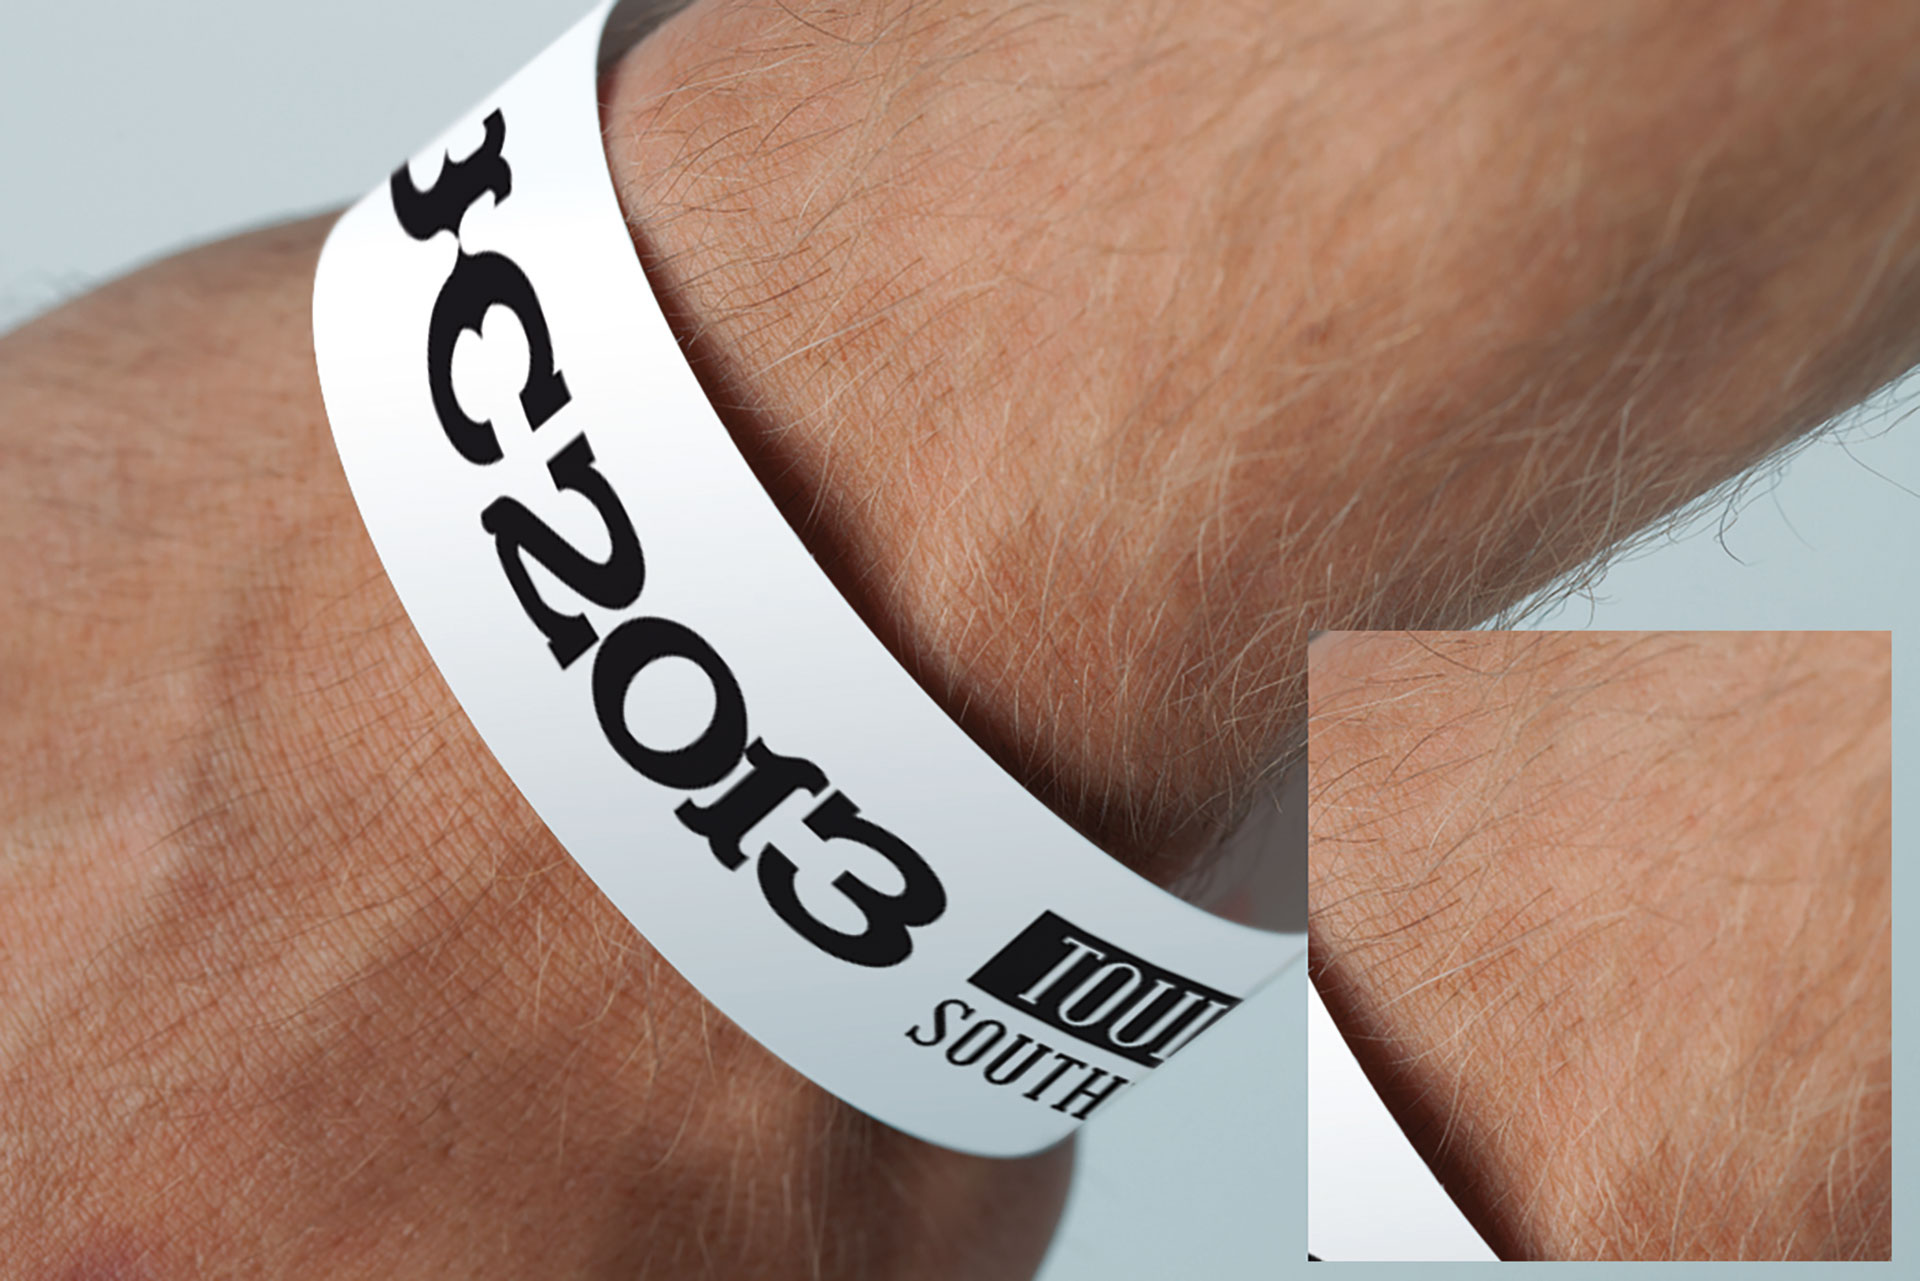 Bracelet festival EJC2013-Cmondada Design